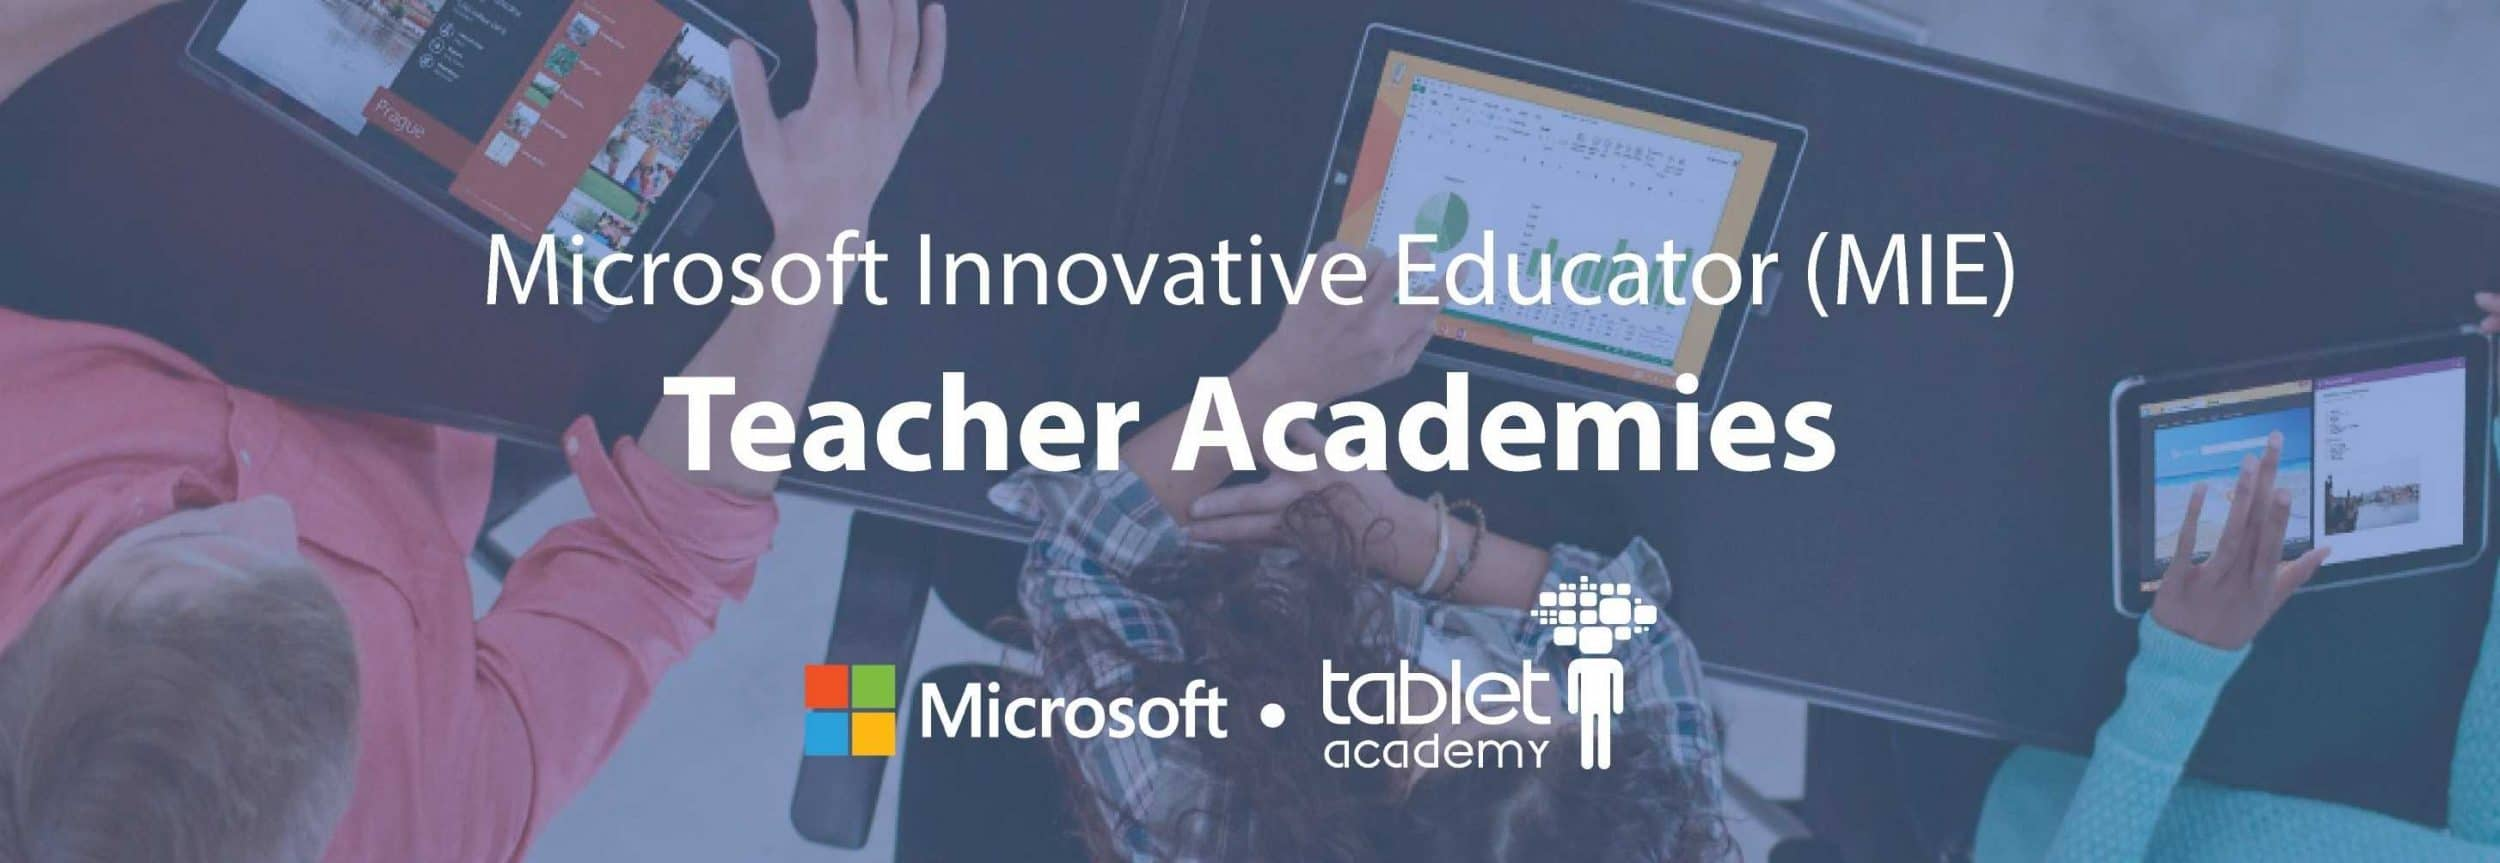 MIE Microsoft Innovative Educator - Teacher Academies